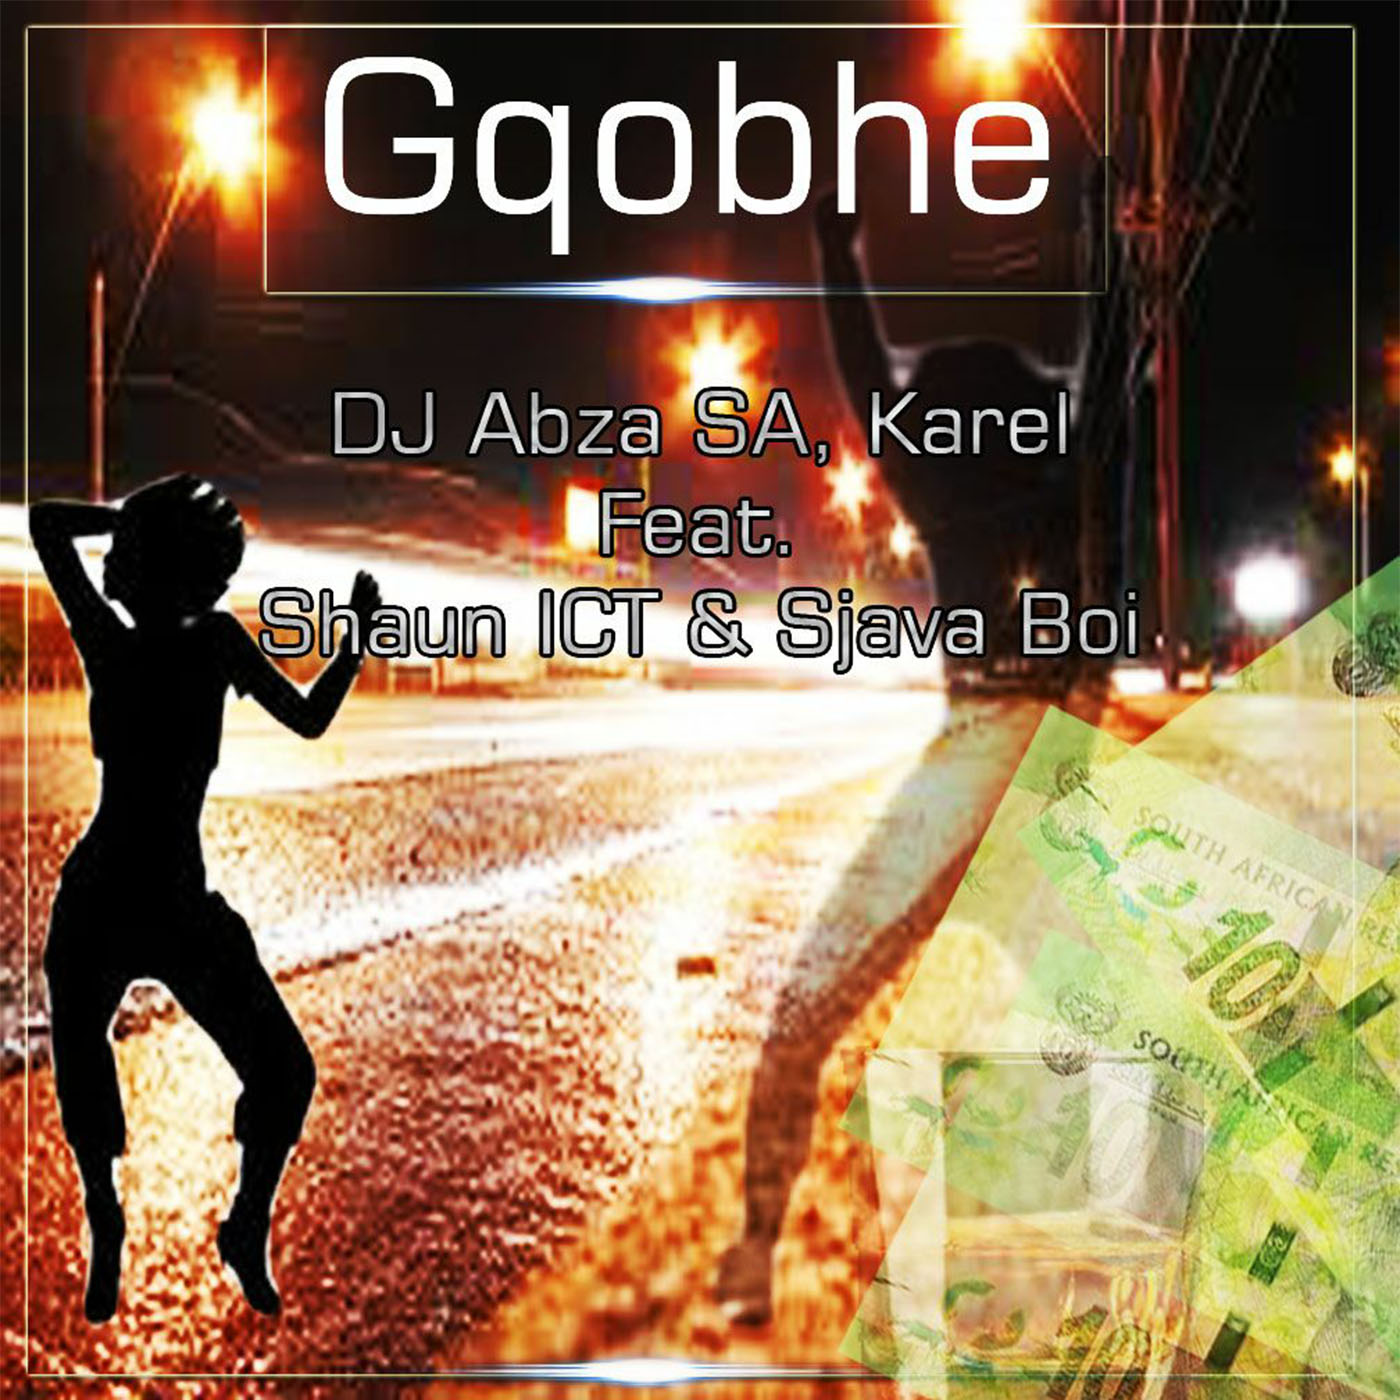 Dj Abza SA & Karel | Gqobhe feat. Shaun ICT & Sjava Boi